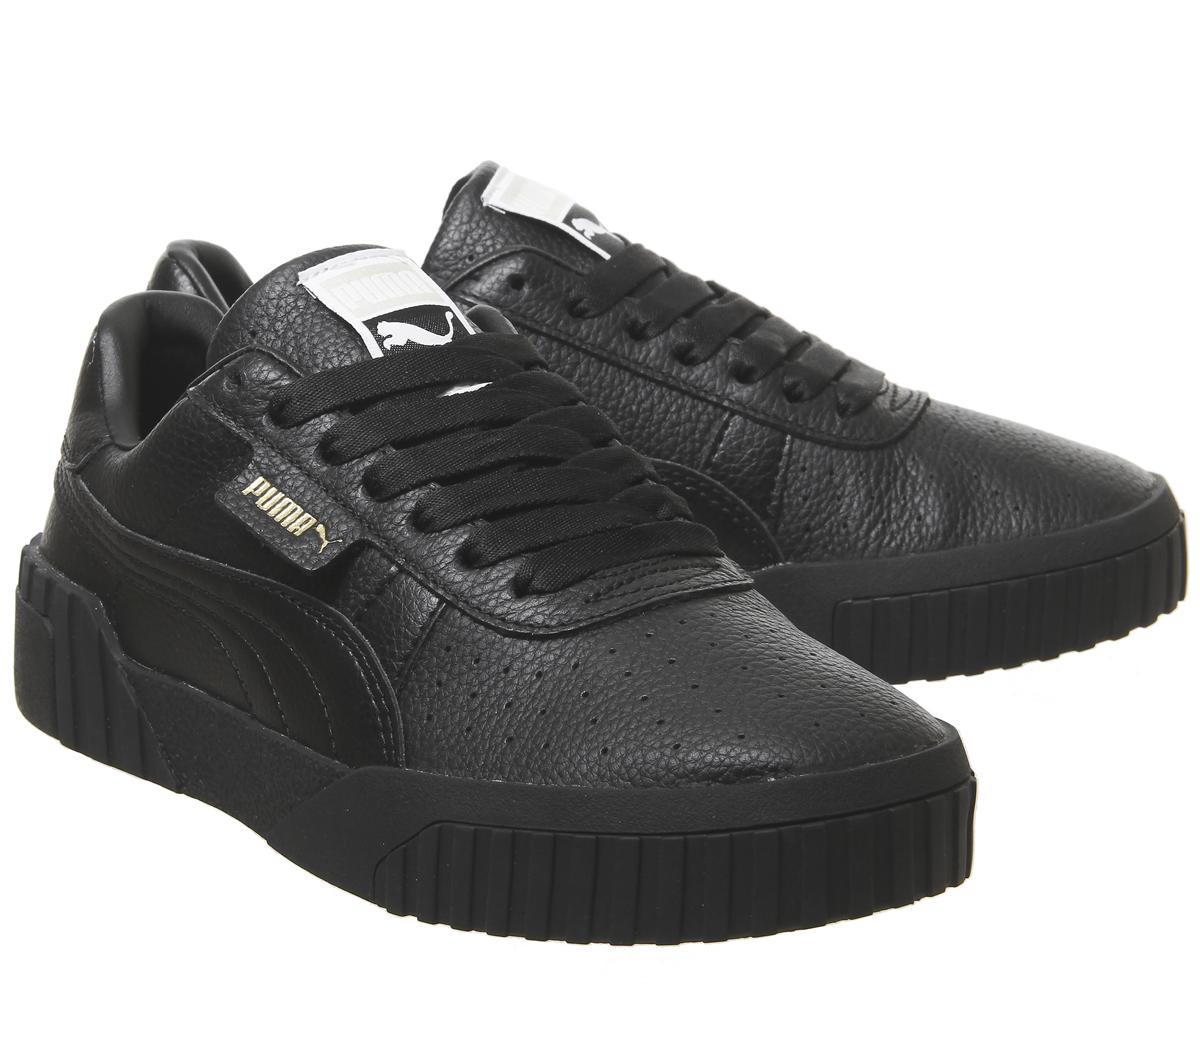 994f410a3d05c5 CENTINELA Mujeres Puma Cali instructores Puma negro Puma F negro zapatillas  zapatos